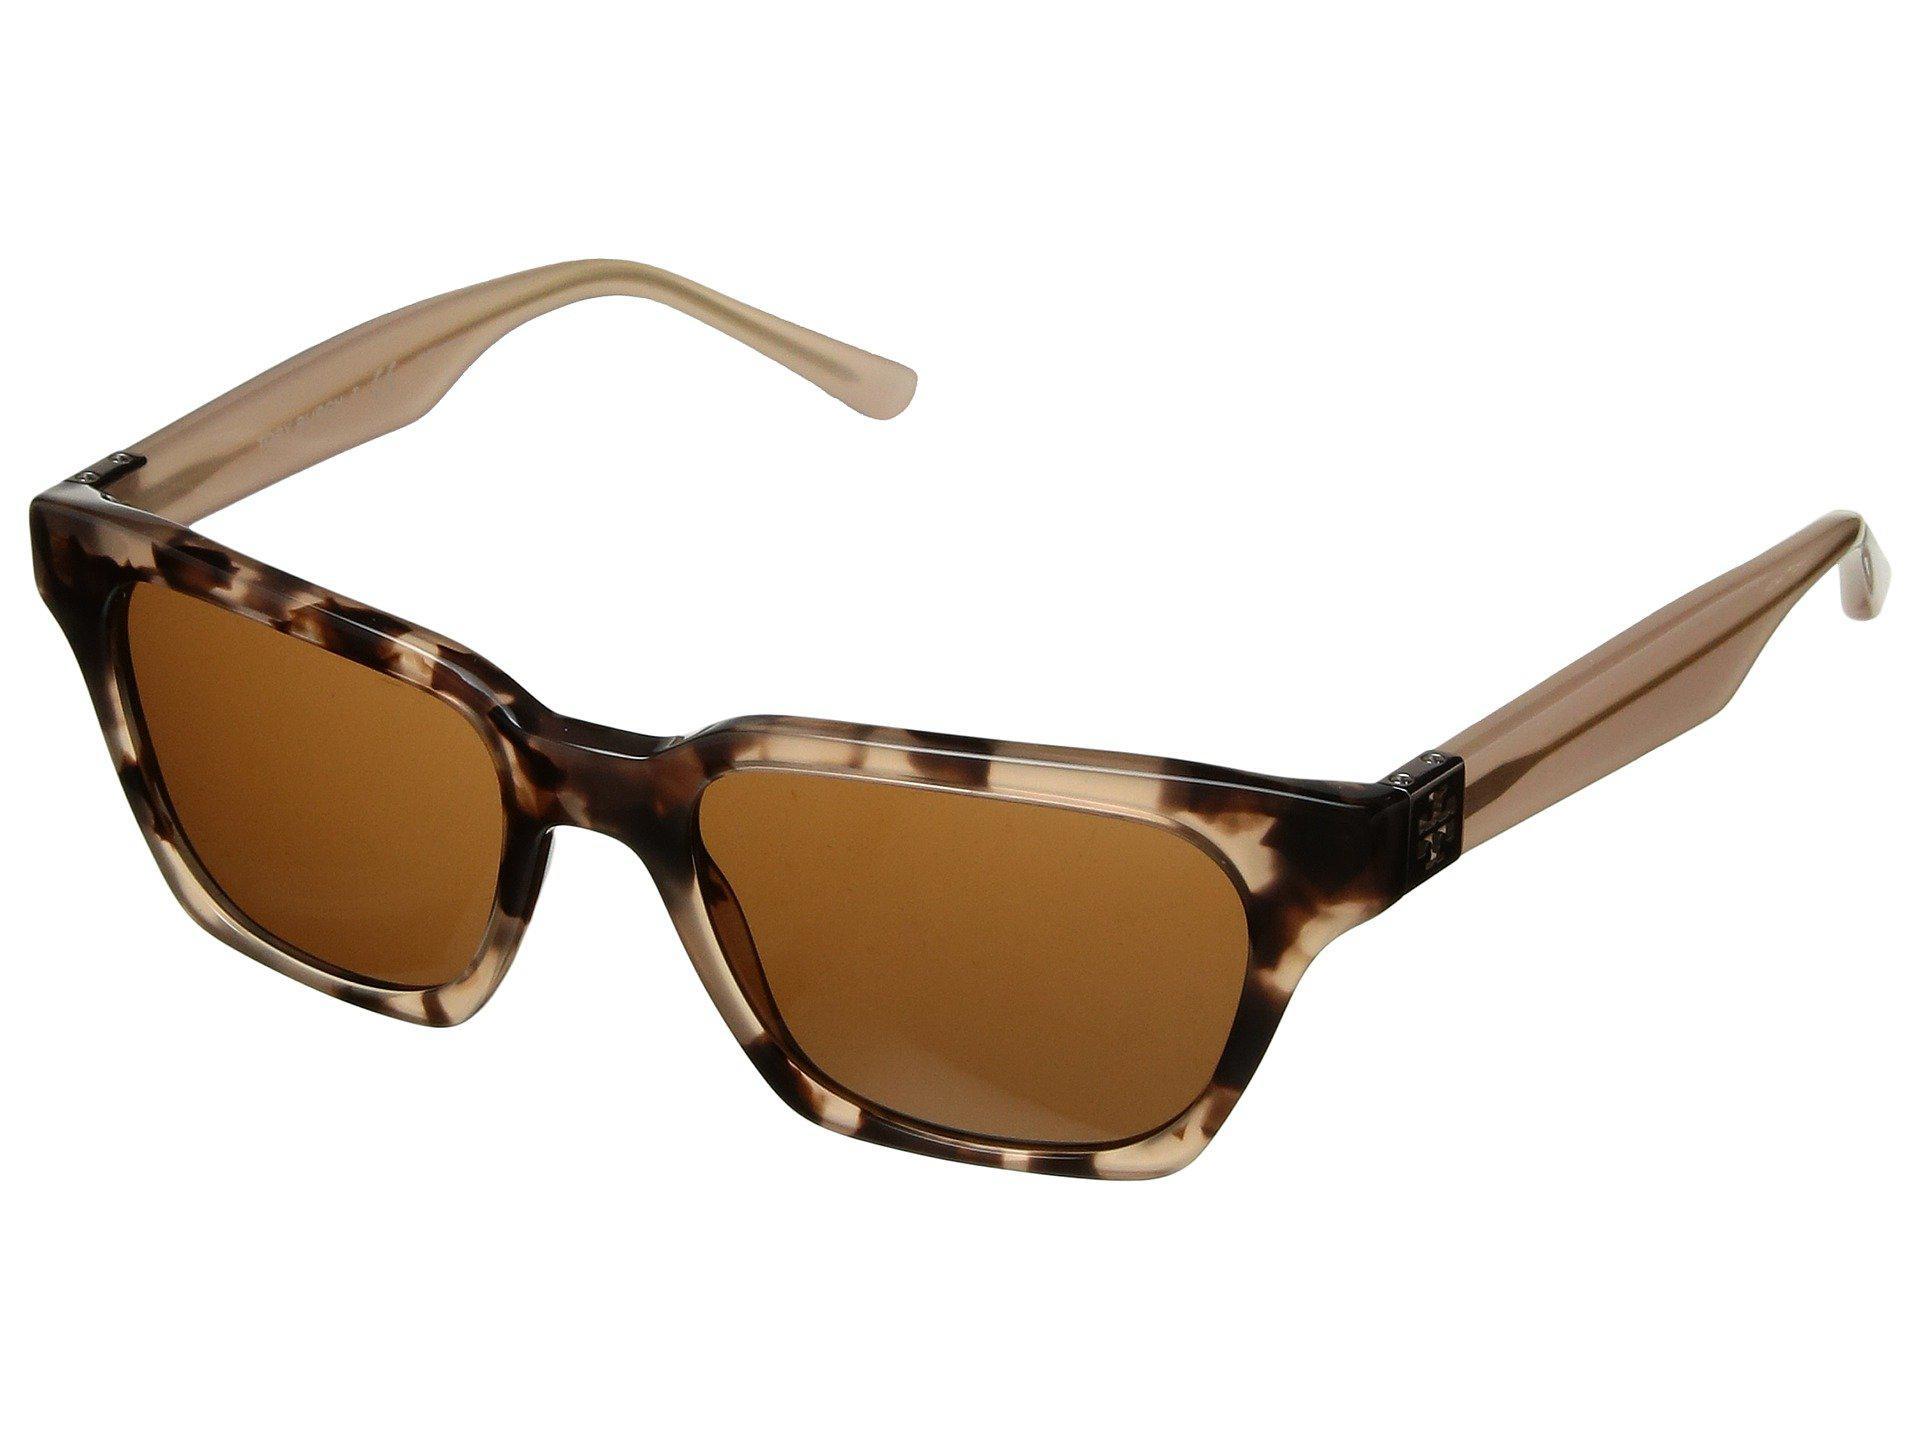 0e088964683c Tory Burch. Women's 0ty7119 51mm (blush Tortoise/solid Brown) Fashion  Sunglasses